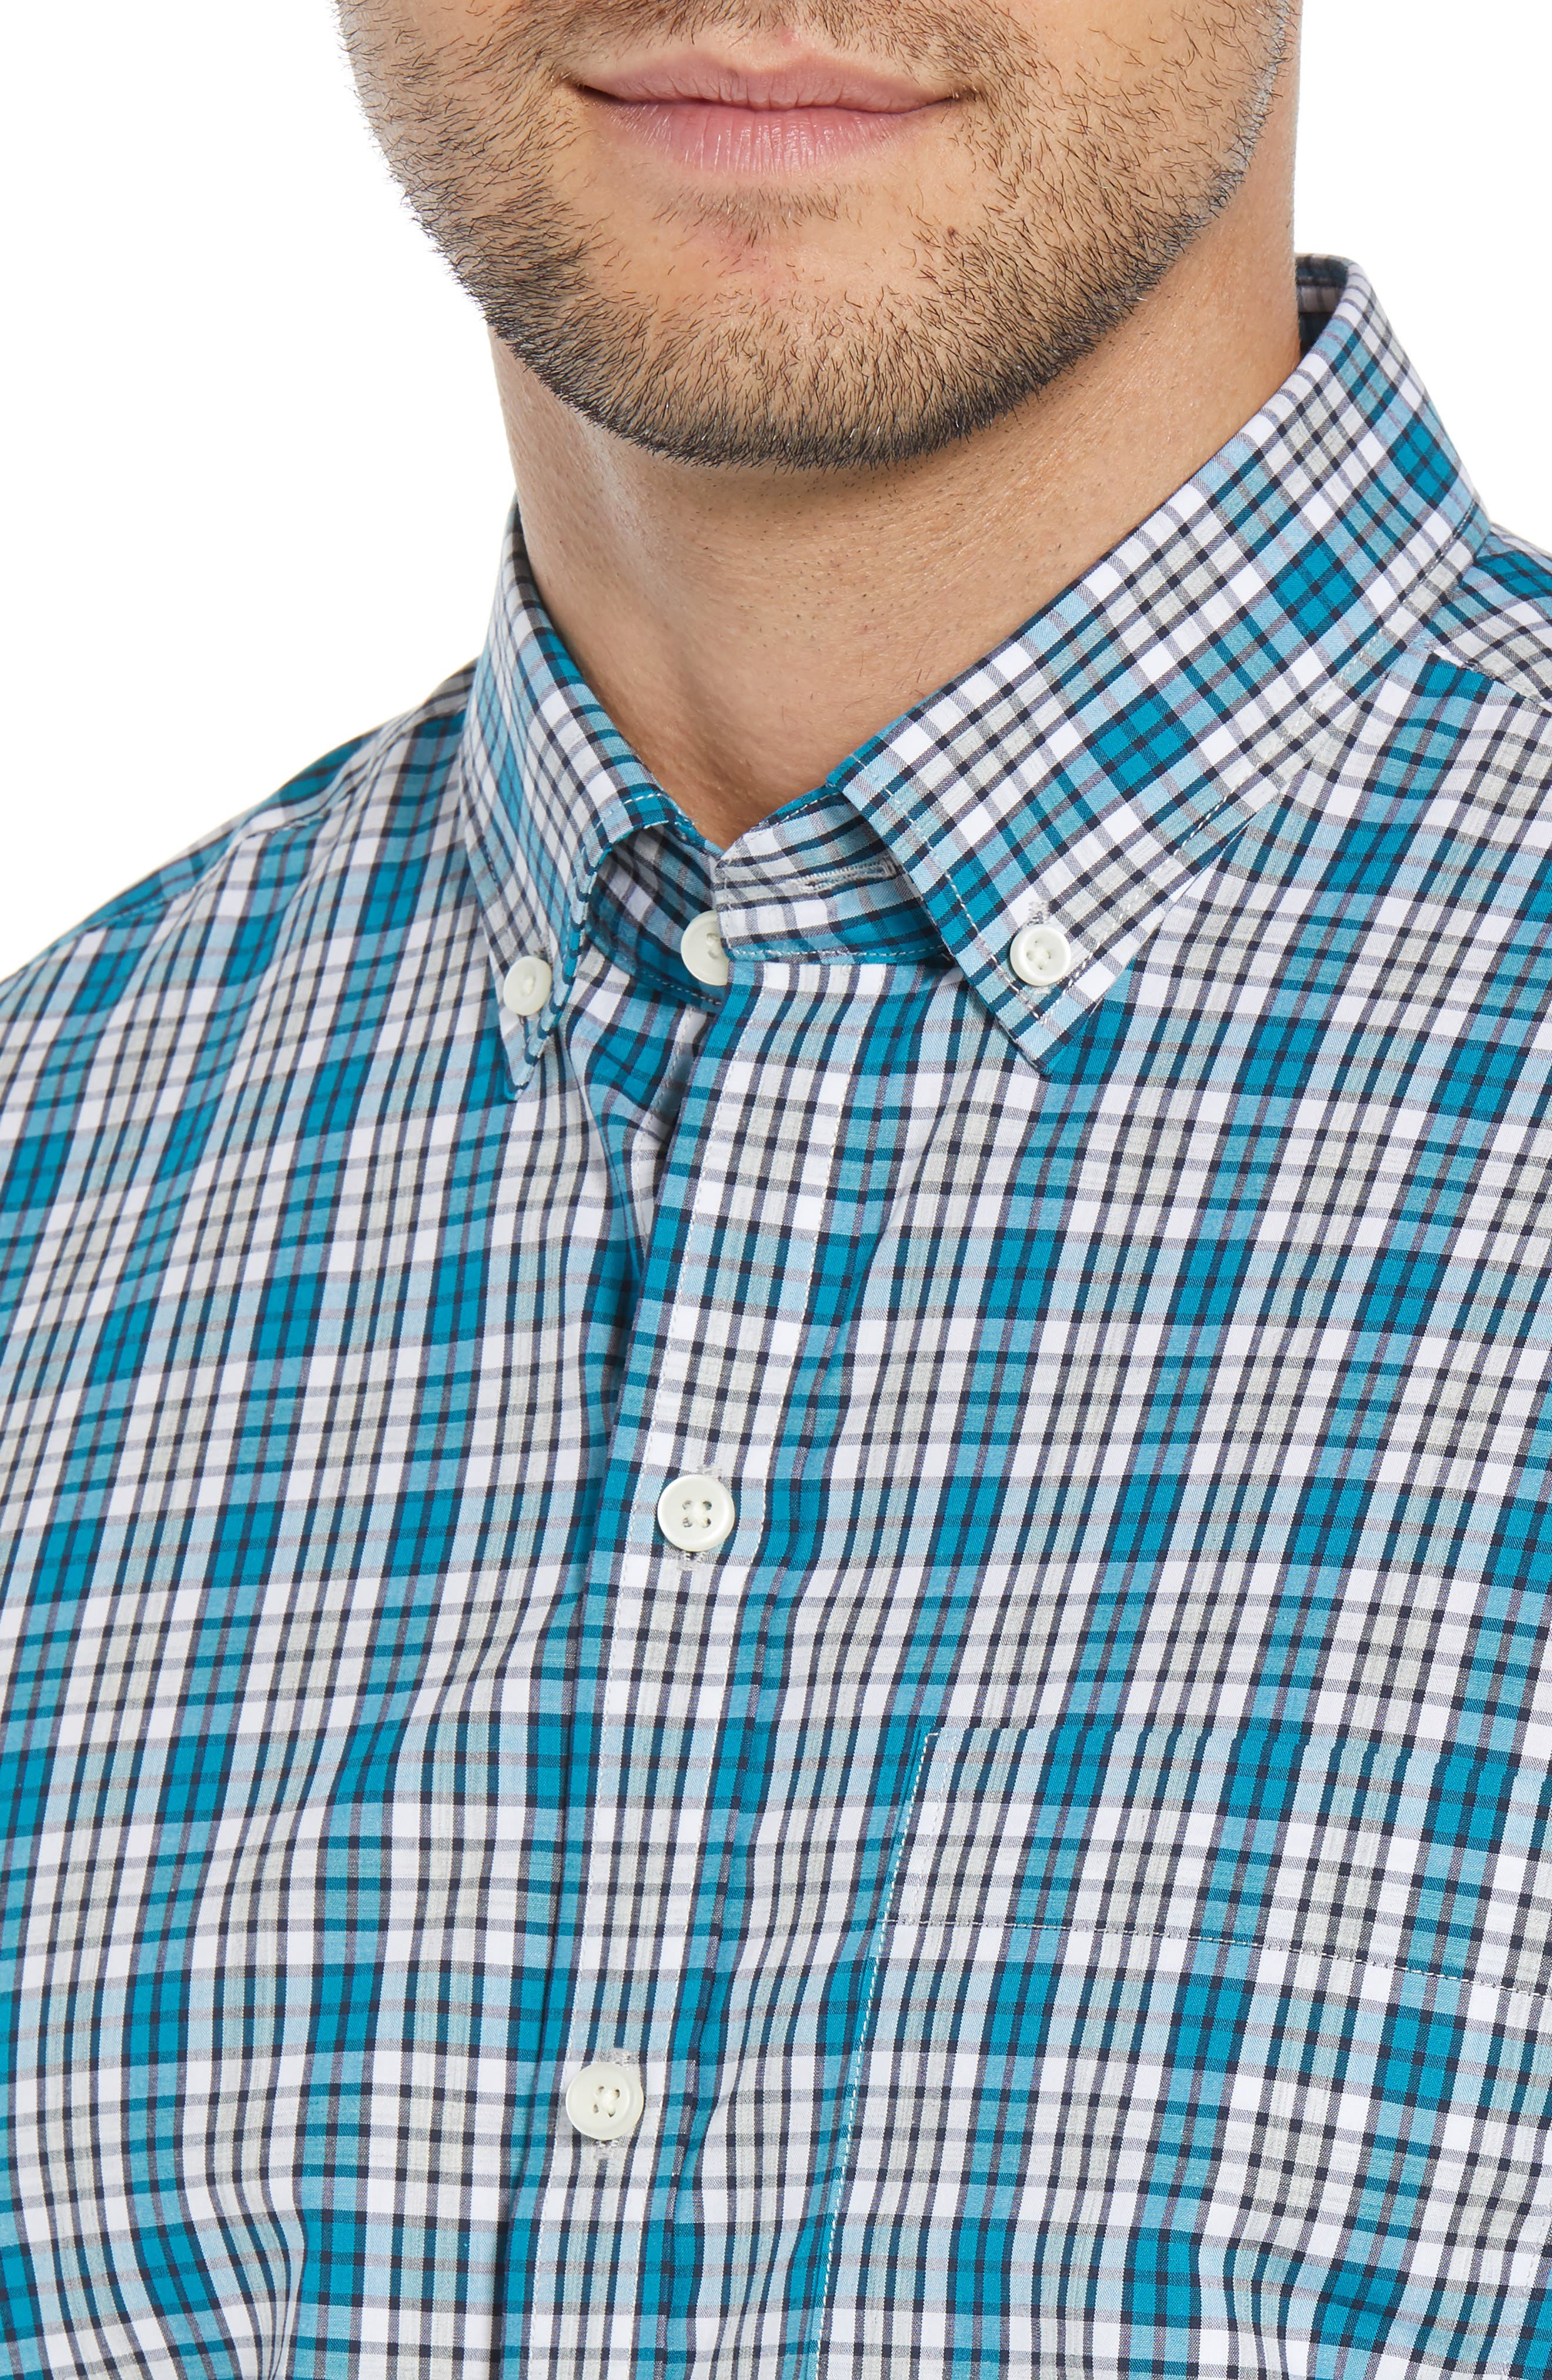 Harris Regular Fit Non-Iron Plaid Sport Shirt,                             Alternate thumbnail 2, color,                             AQUATIC